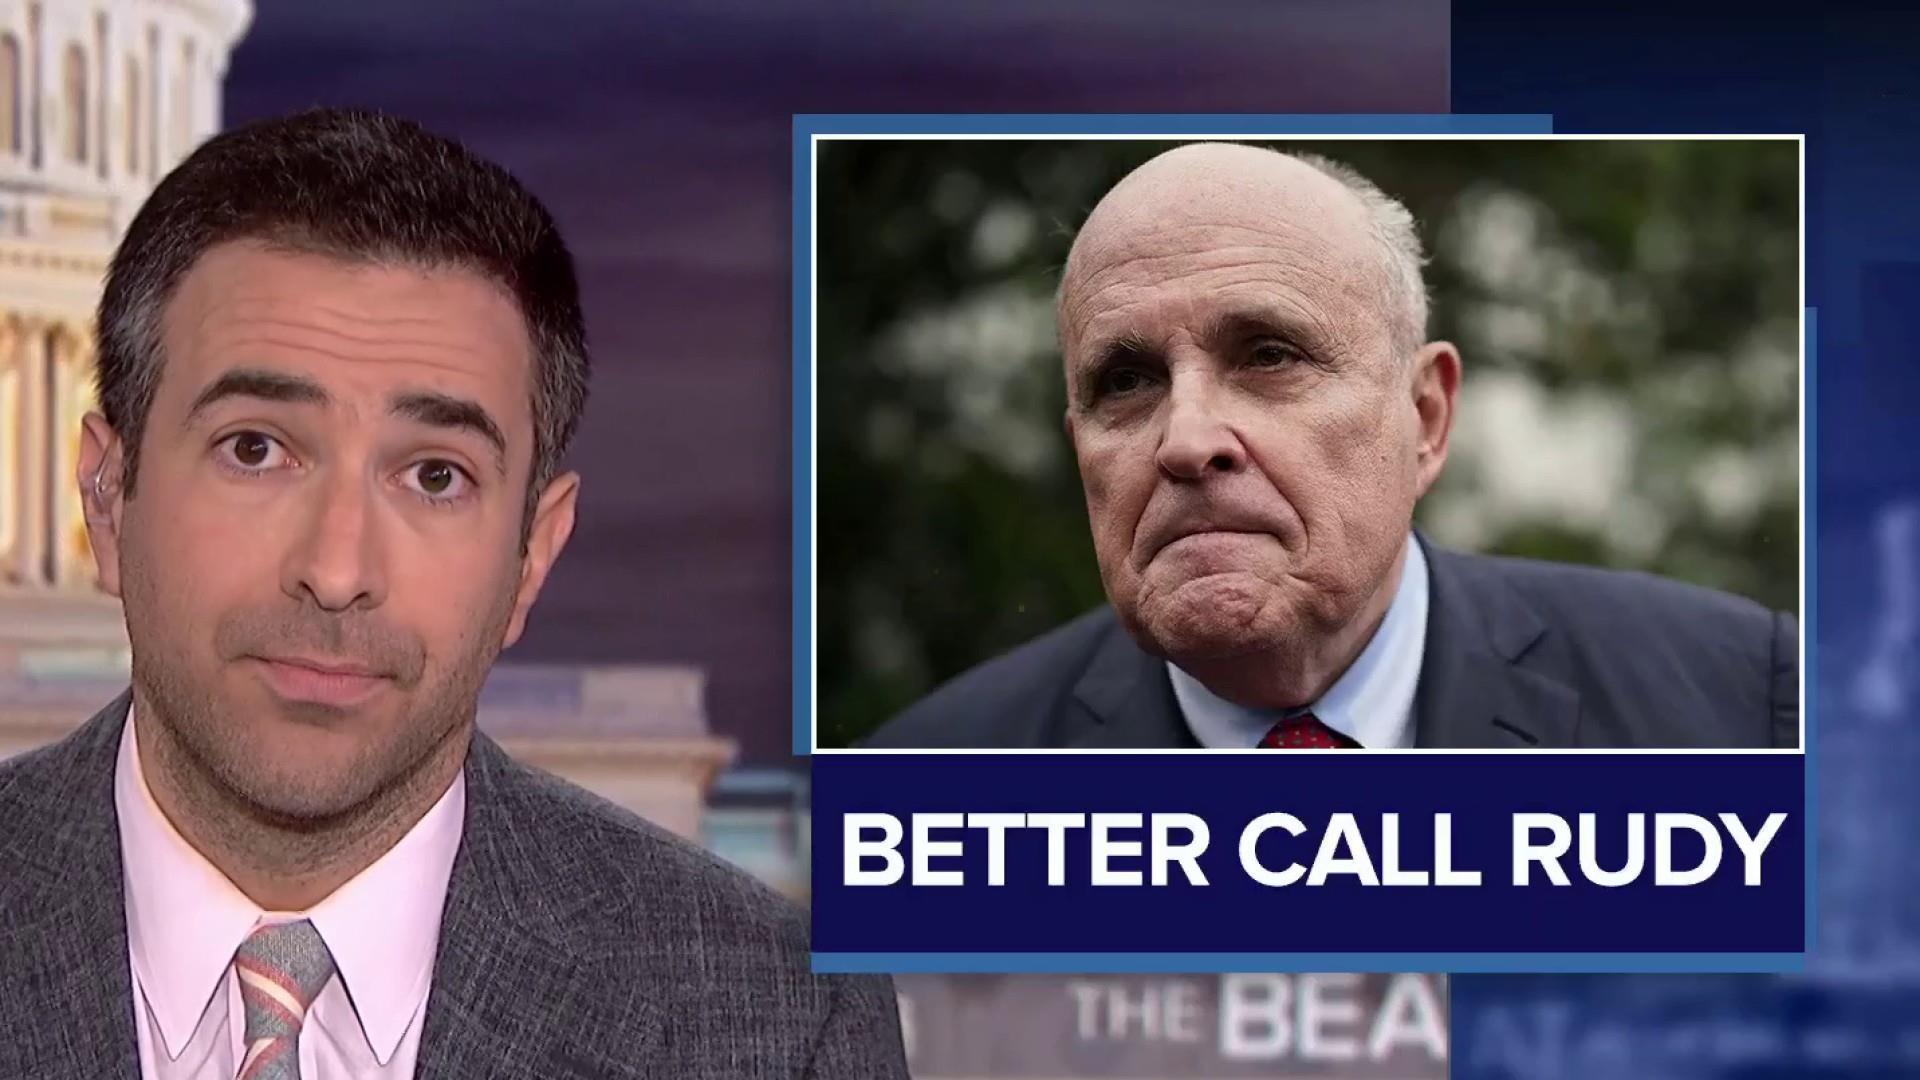 From bombshell news to Giuliani 'grenade': Trump aide warned Ukraine plot like a criminal 'drug deal'